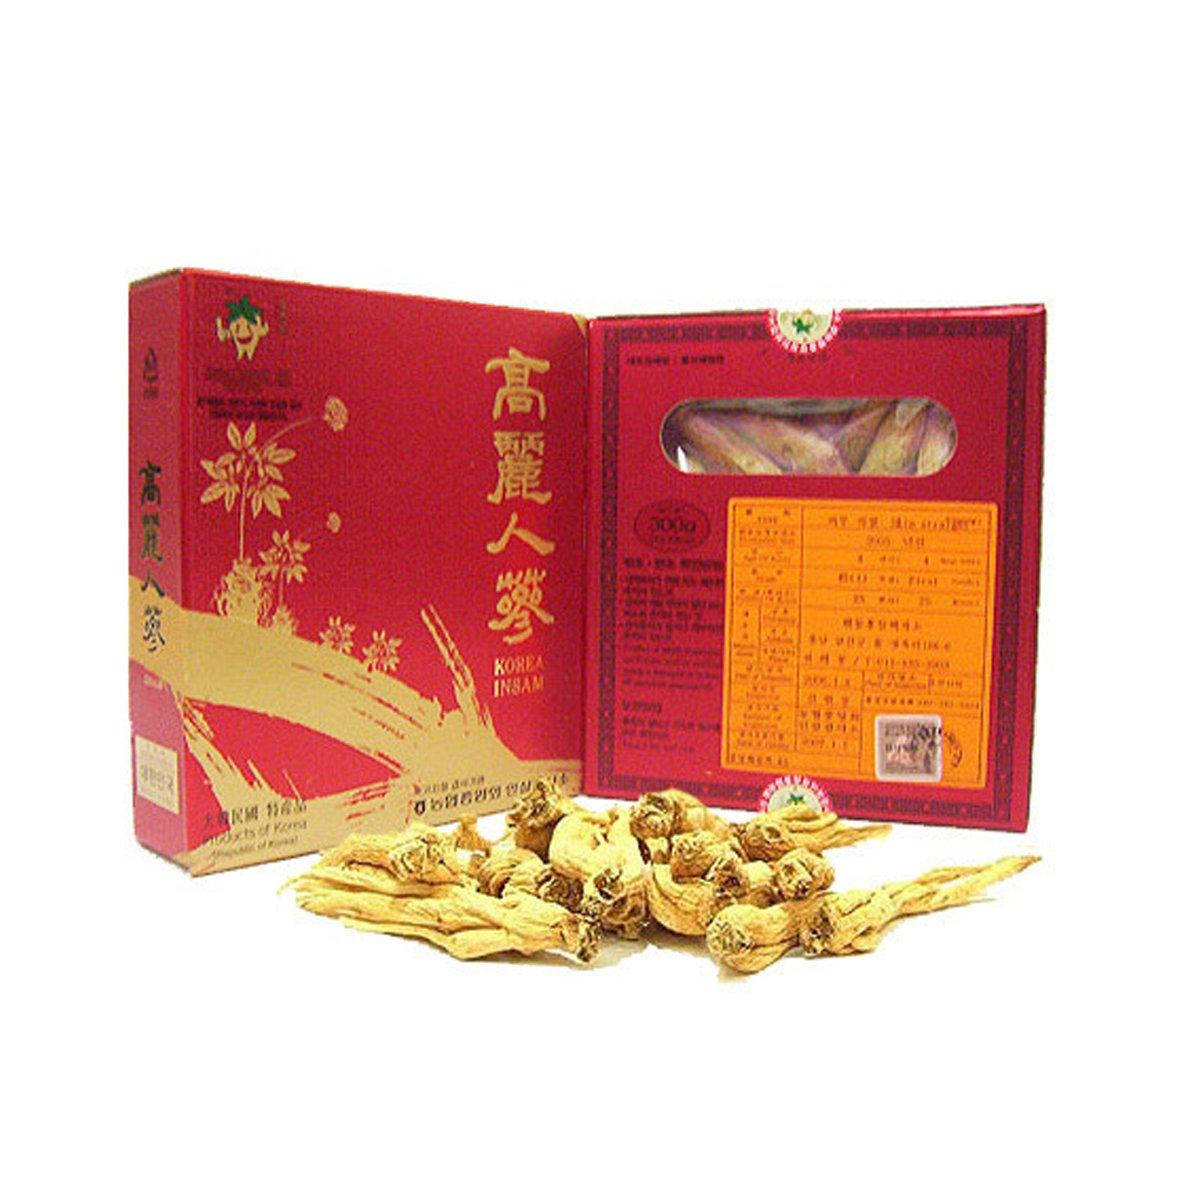 [Medicinal Korean Herb] Premium Korean Koryeo Ginseng 4 Years Old (Renshen/고려 인삼) Dried Bulk Herbs 300g (50 Roots) by HERBstory (Image #2)